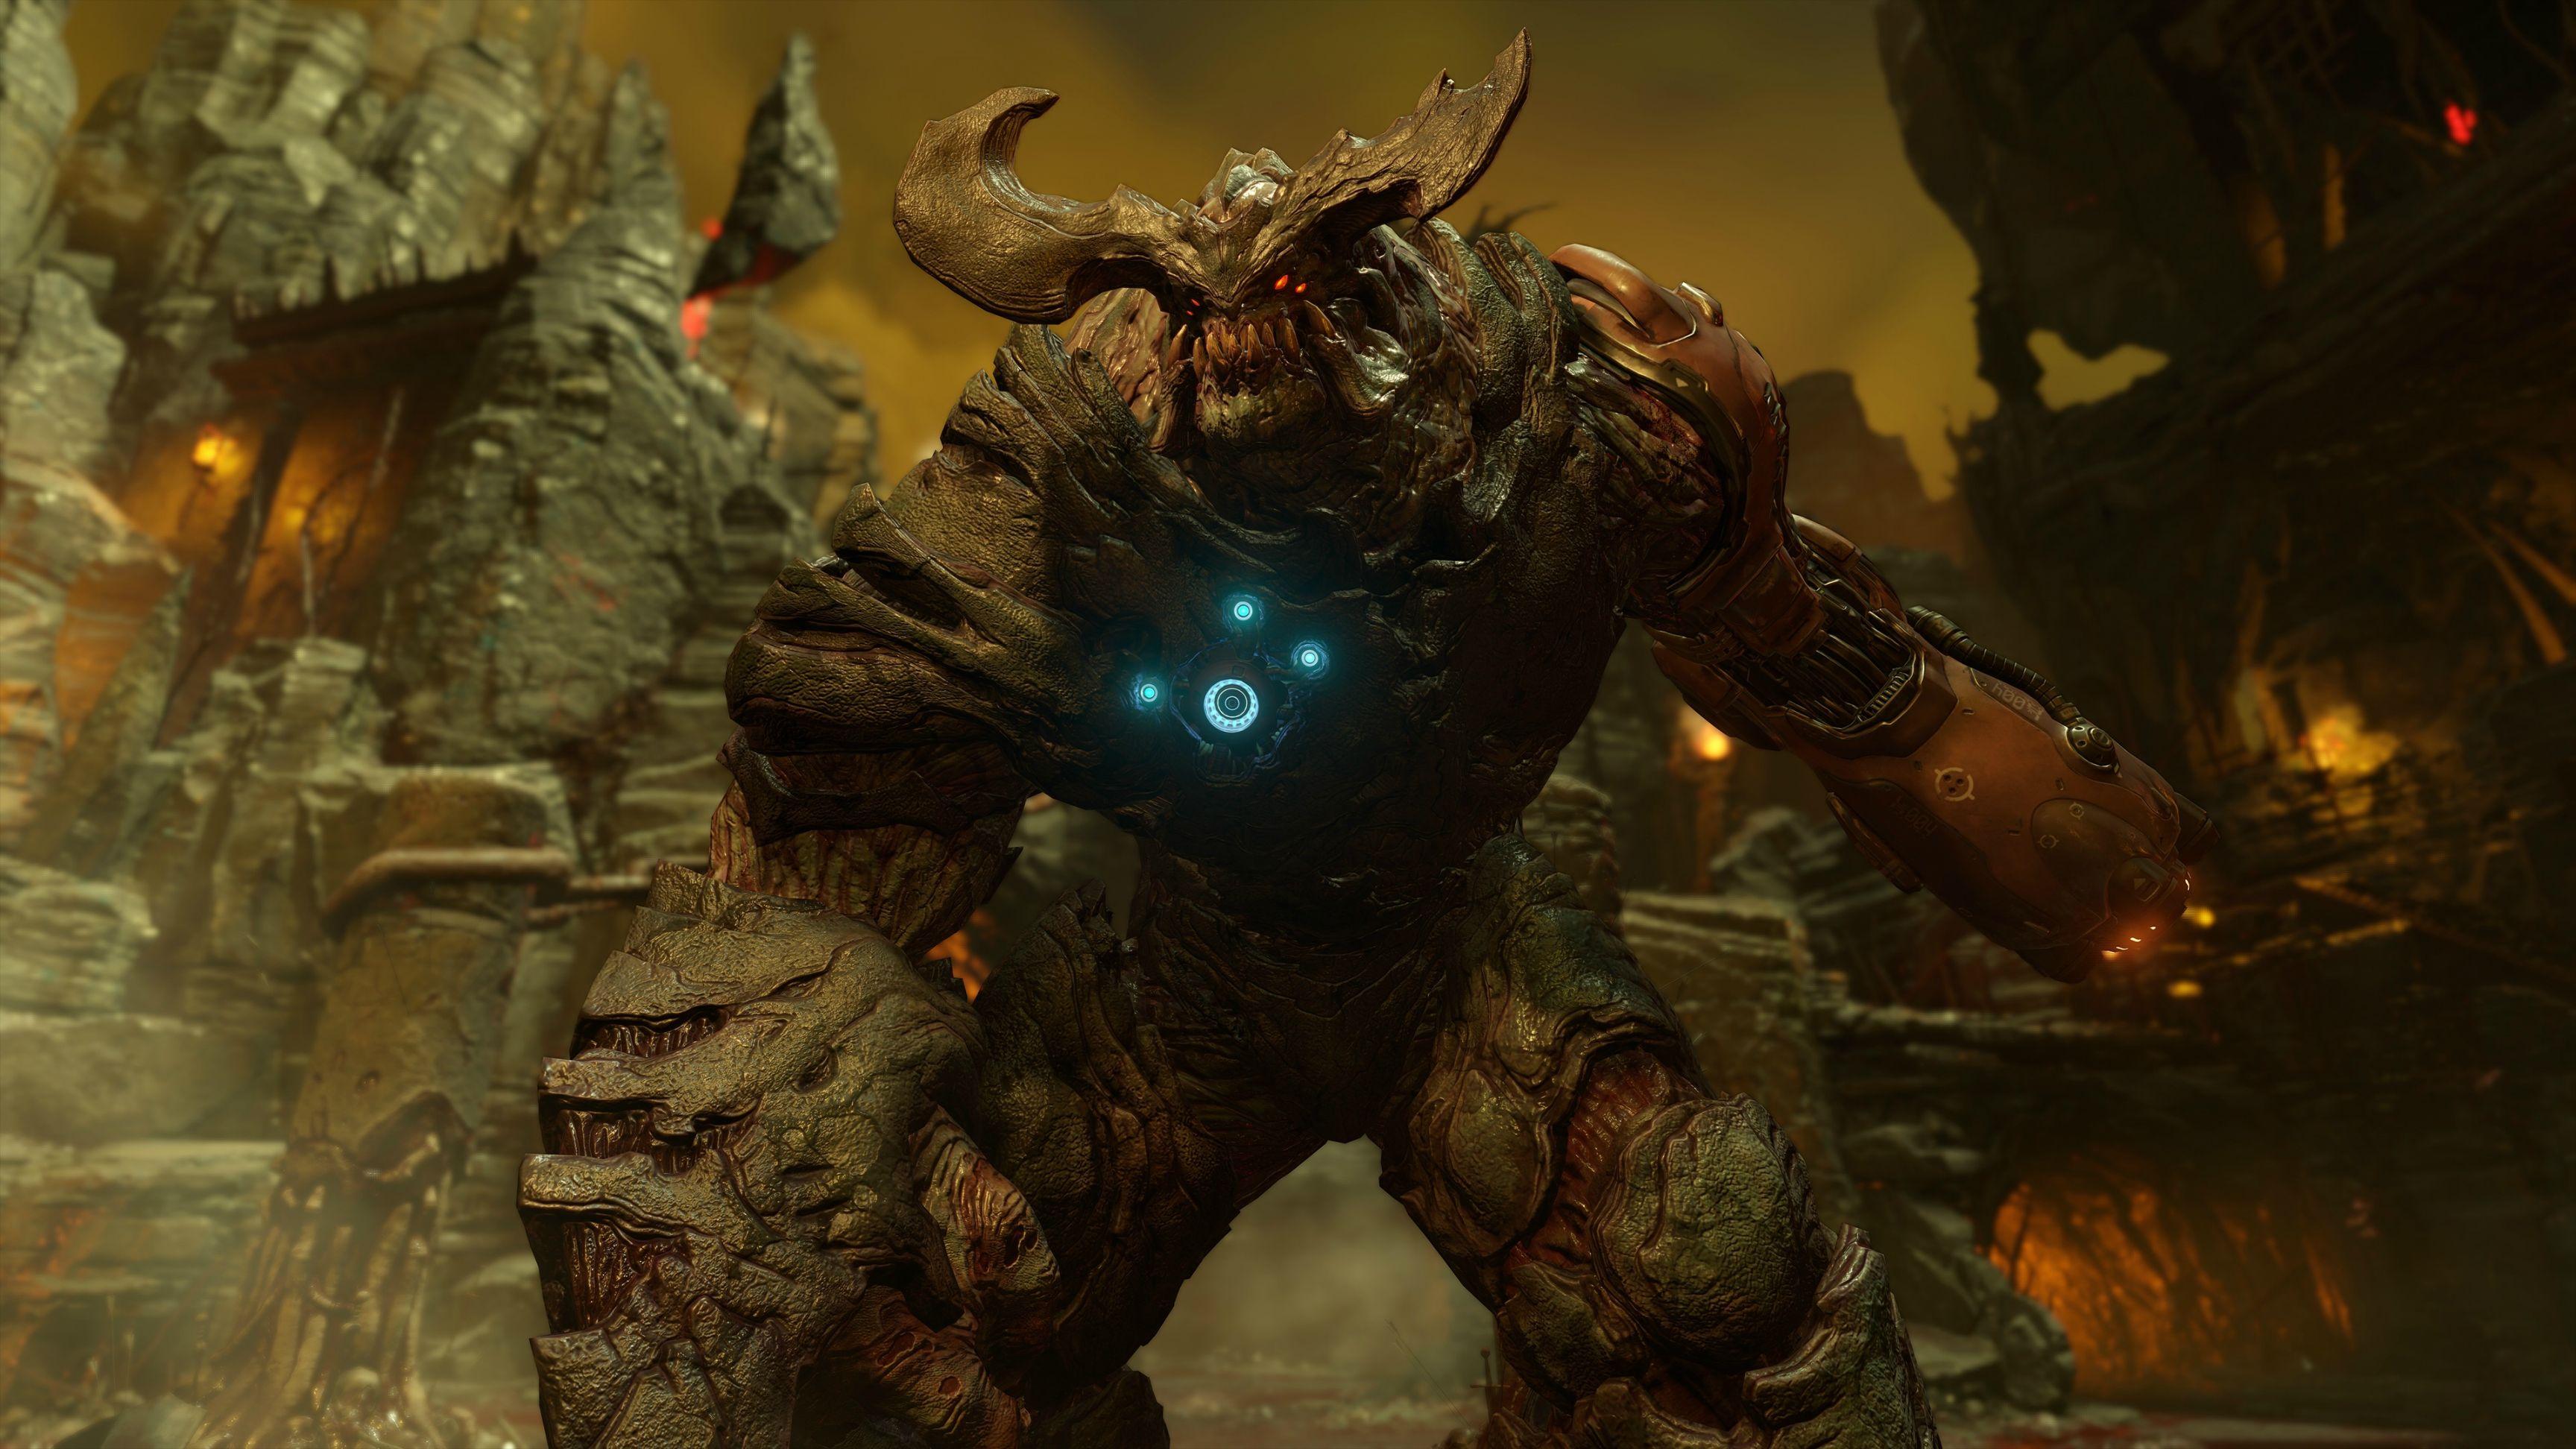 Nový Doom na jaře 2016 s brokovnicí, motorovkou a brutalitou 110121